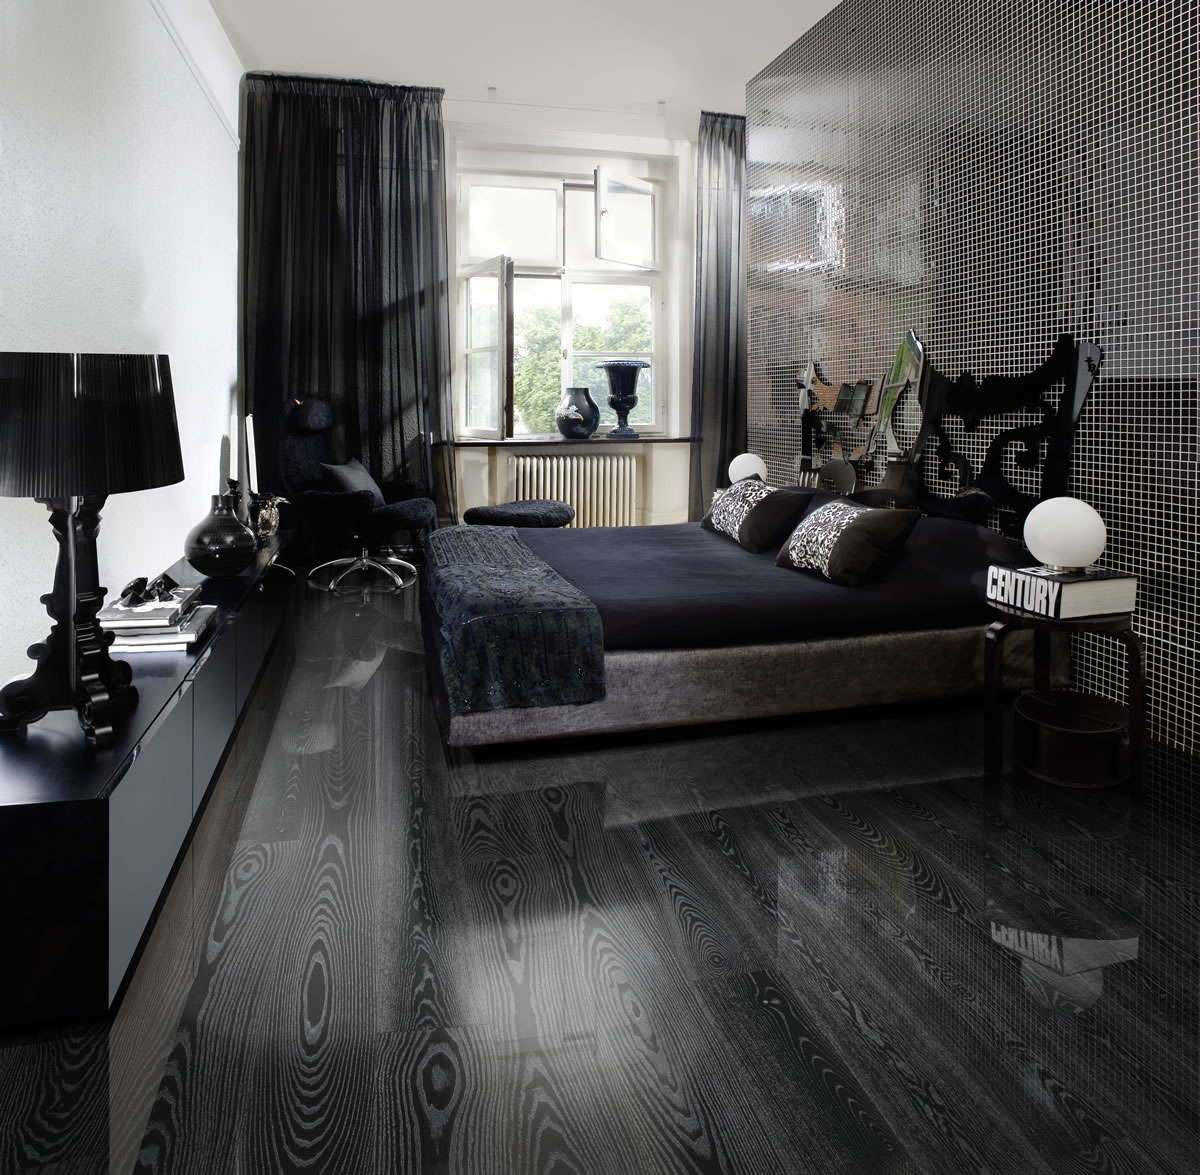 Bon Flooring Supplies